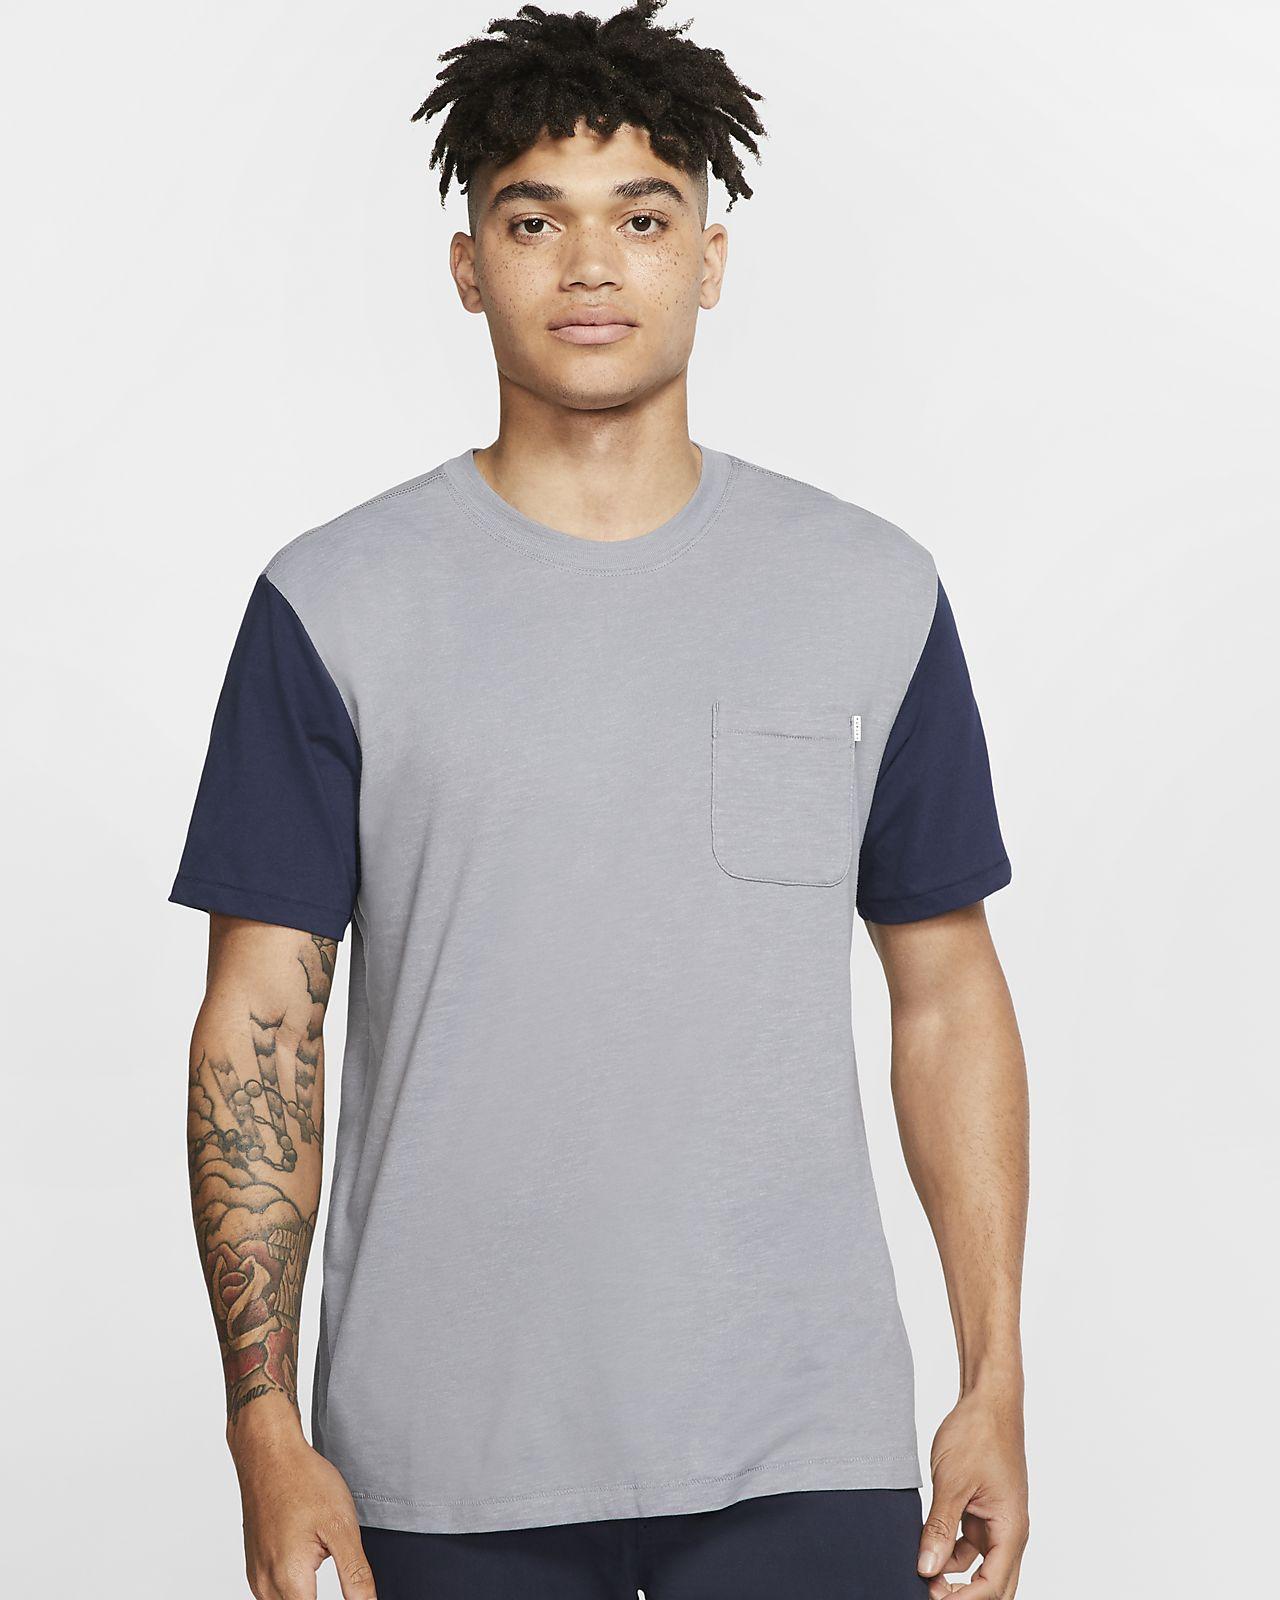 Hurley Dri-FIT Bridge Men's Short-Sleeve Knit Top